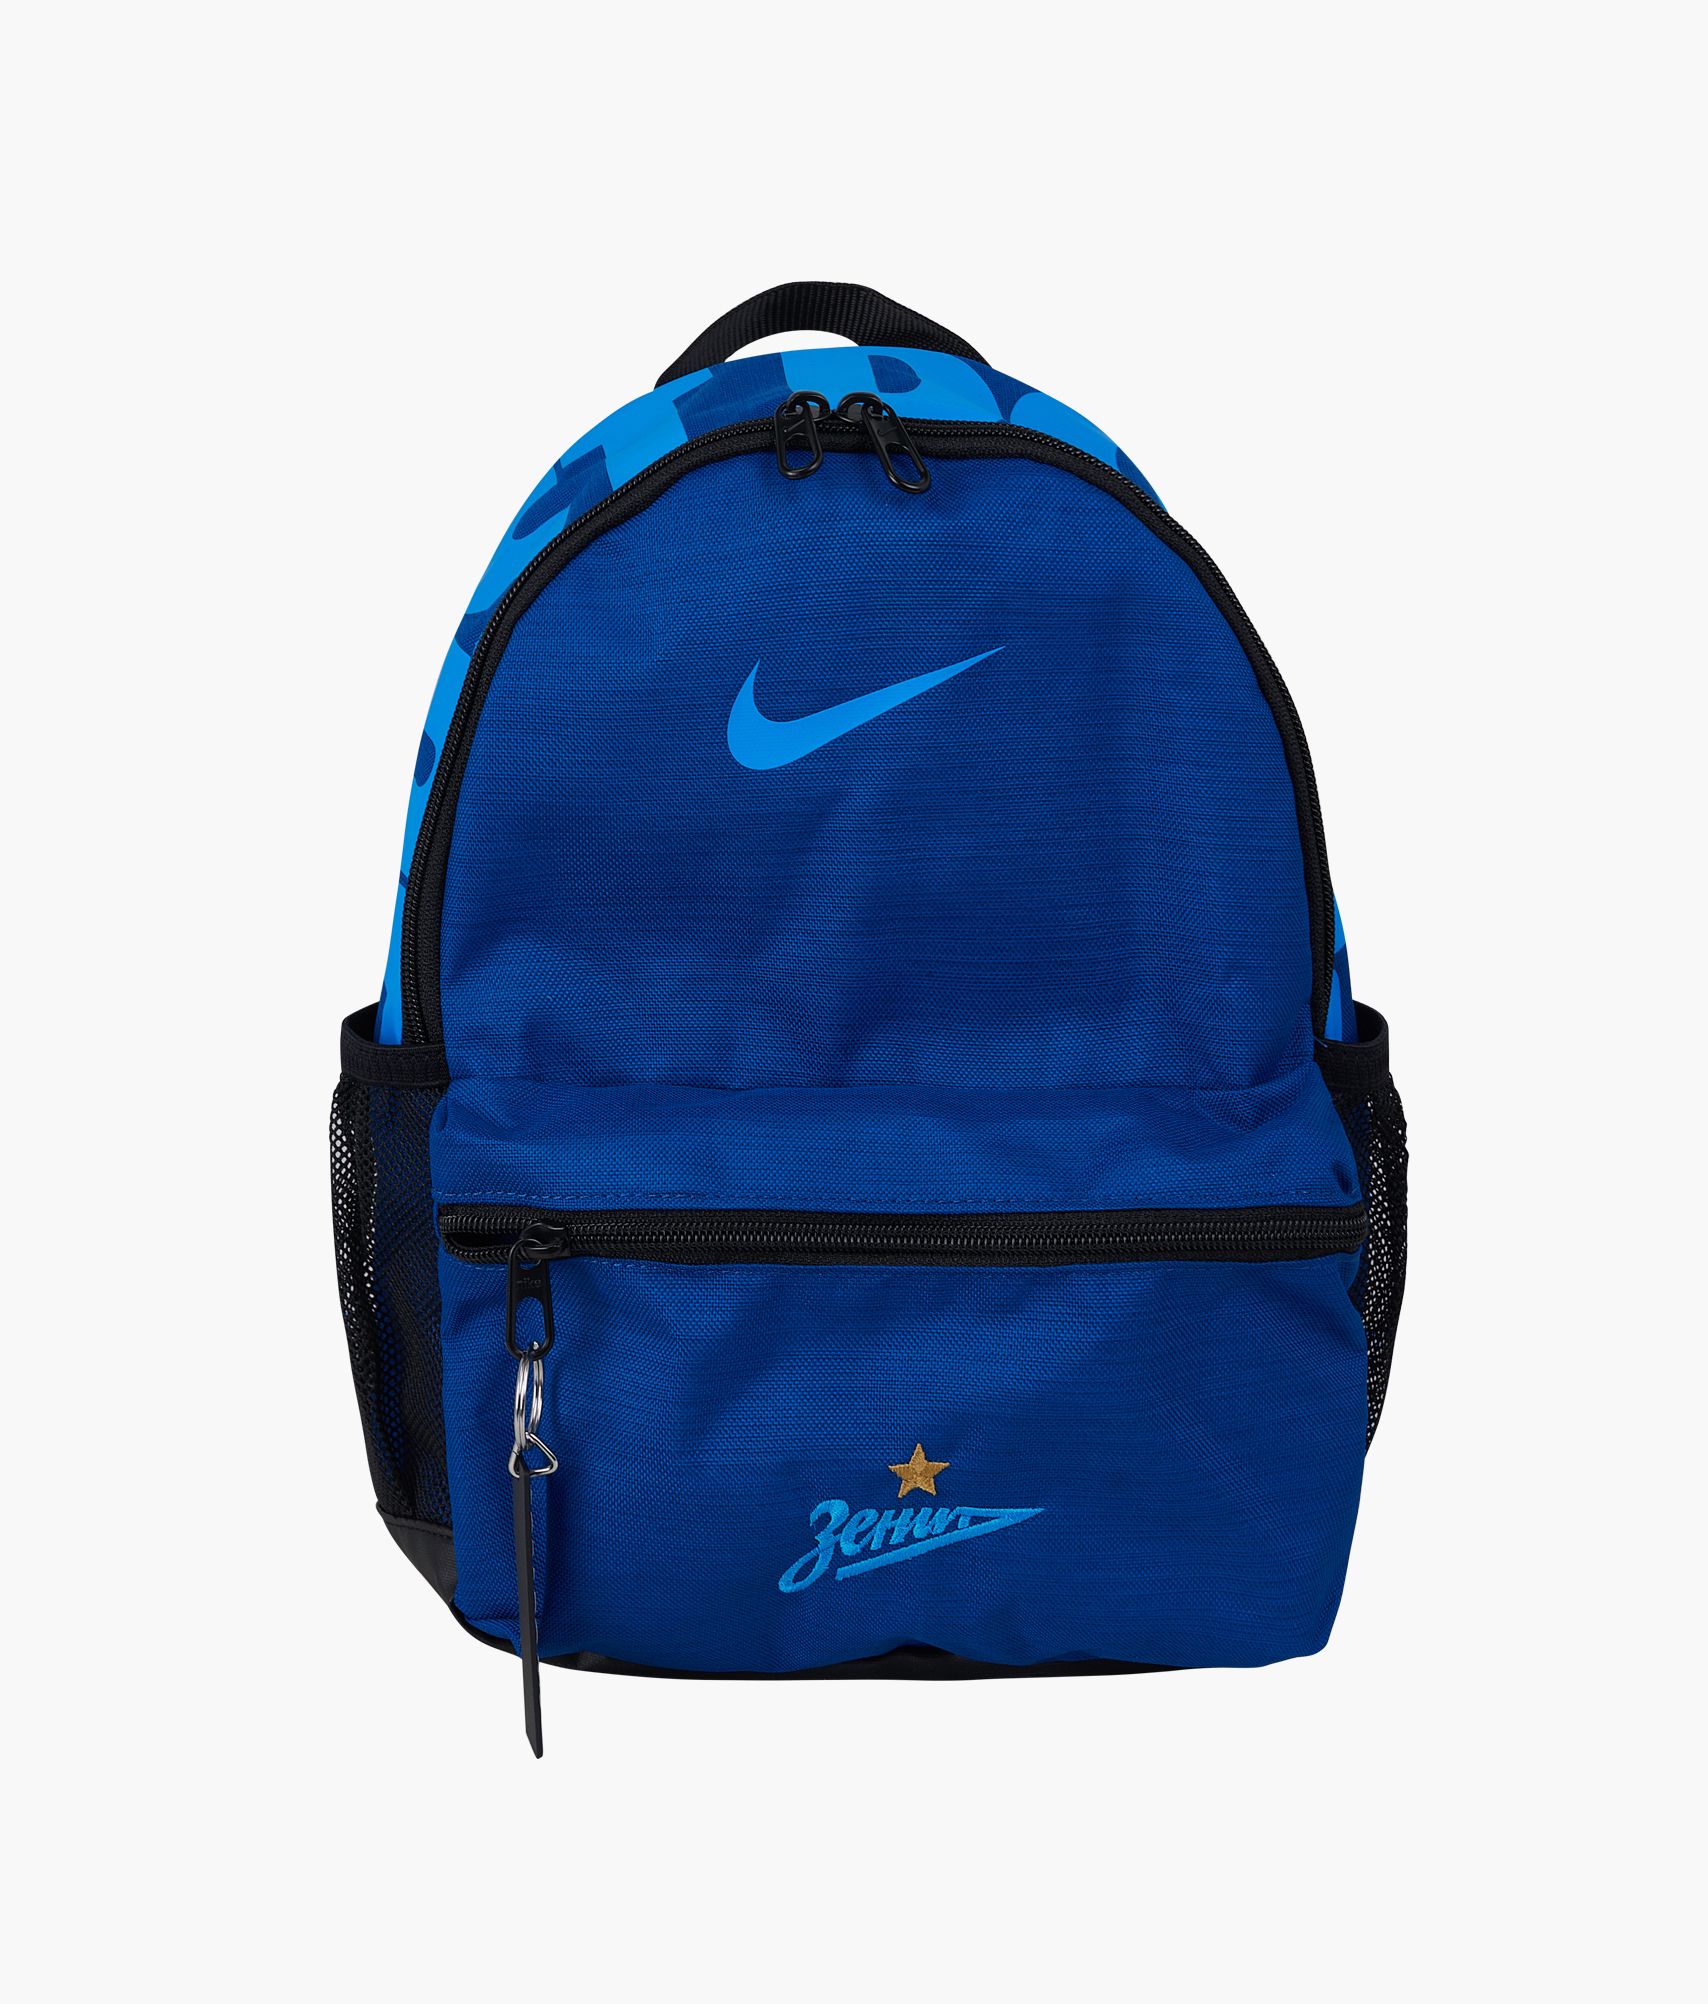 Рюкзак детский Nike Nike Цвет-Синий цена 2017